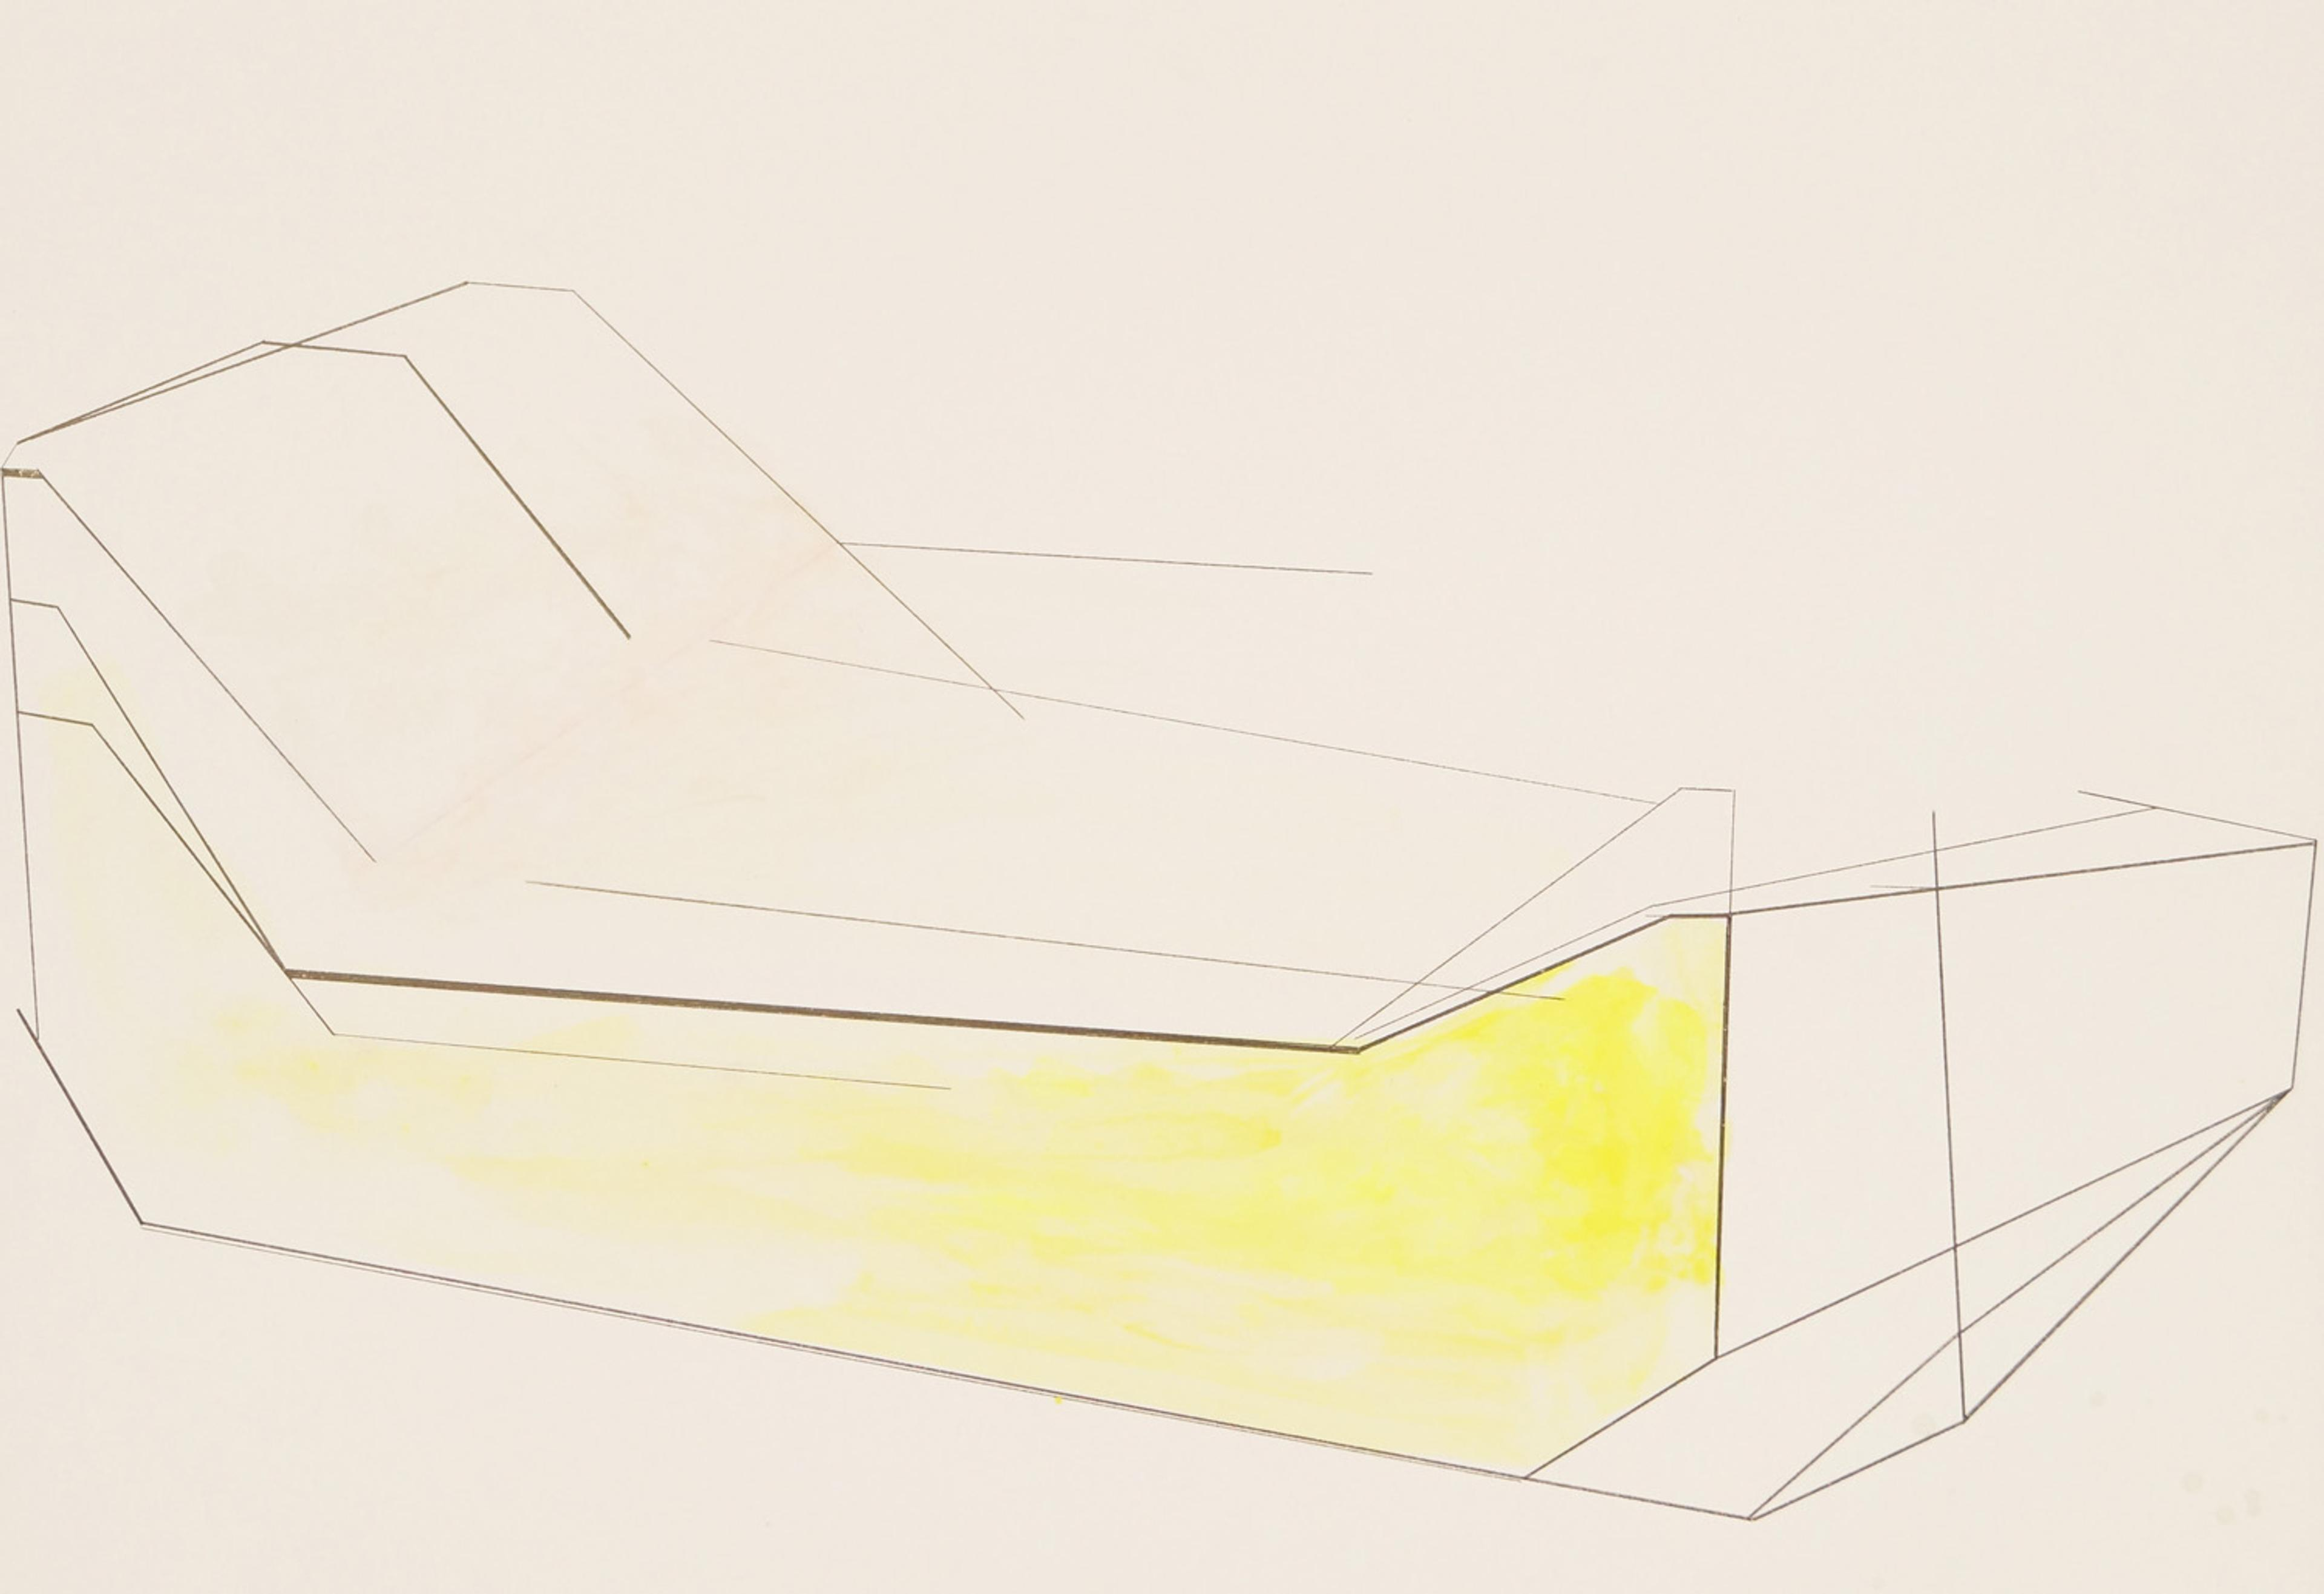 artwork Running along the object II by Petra Gell